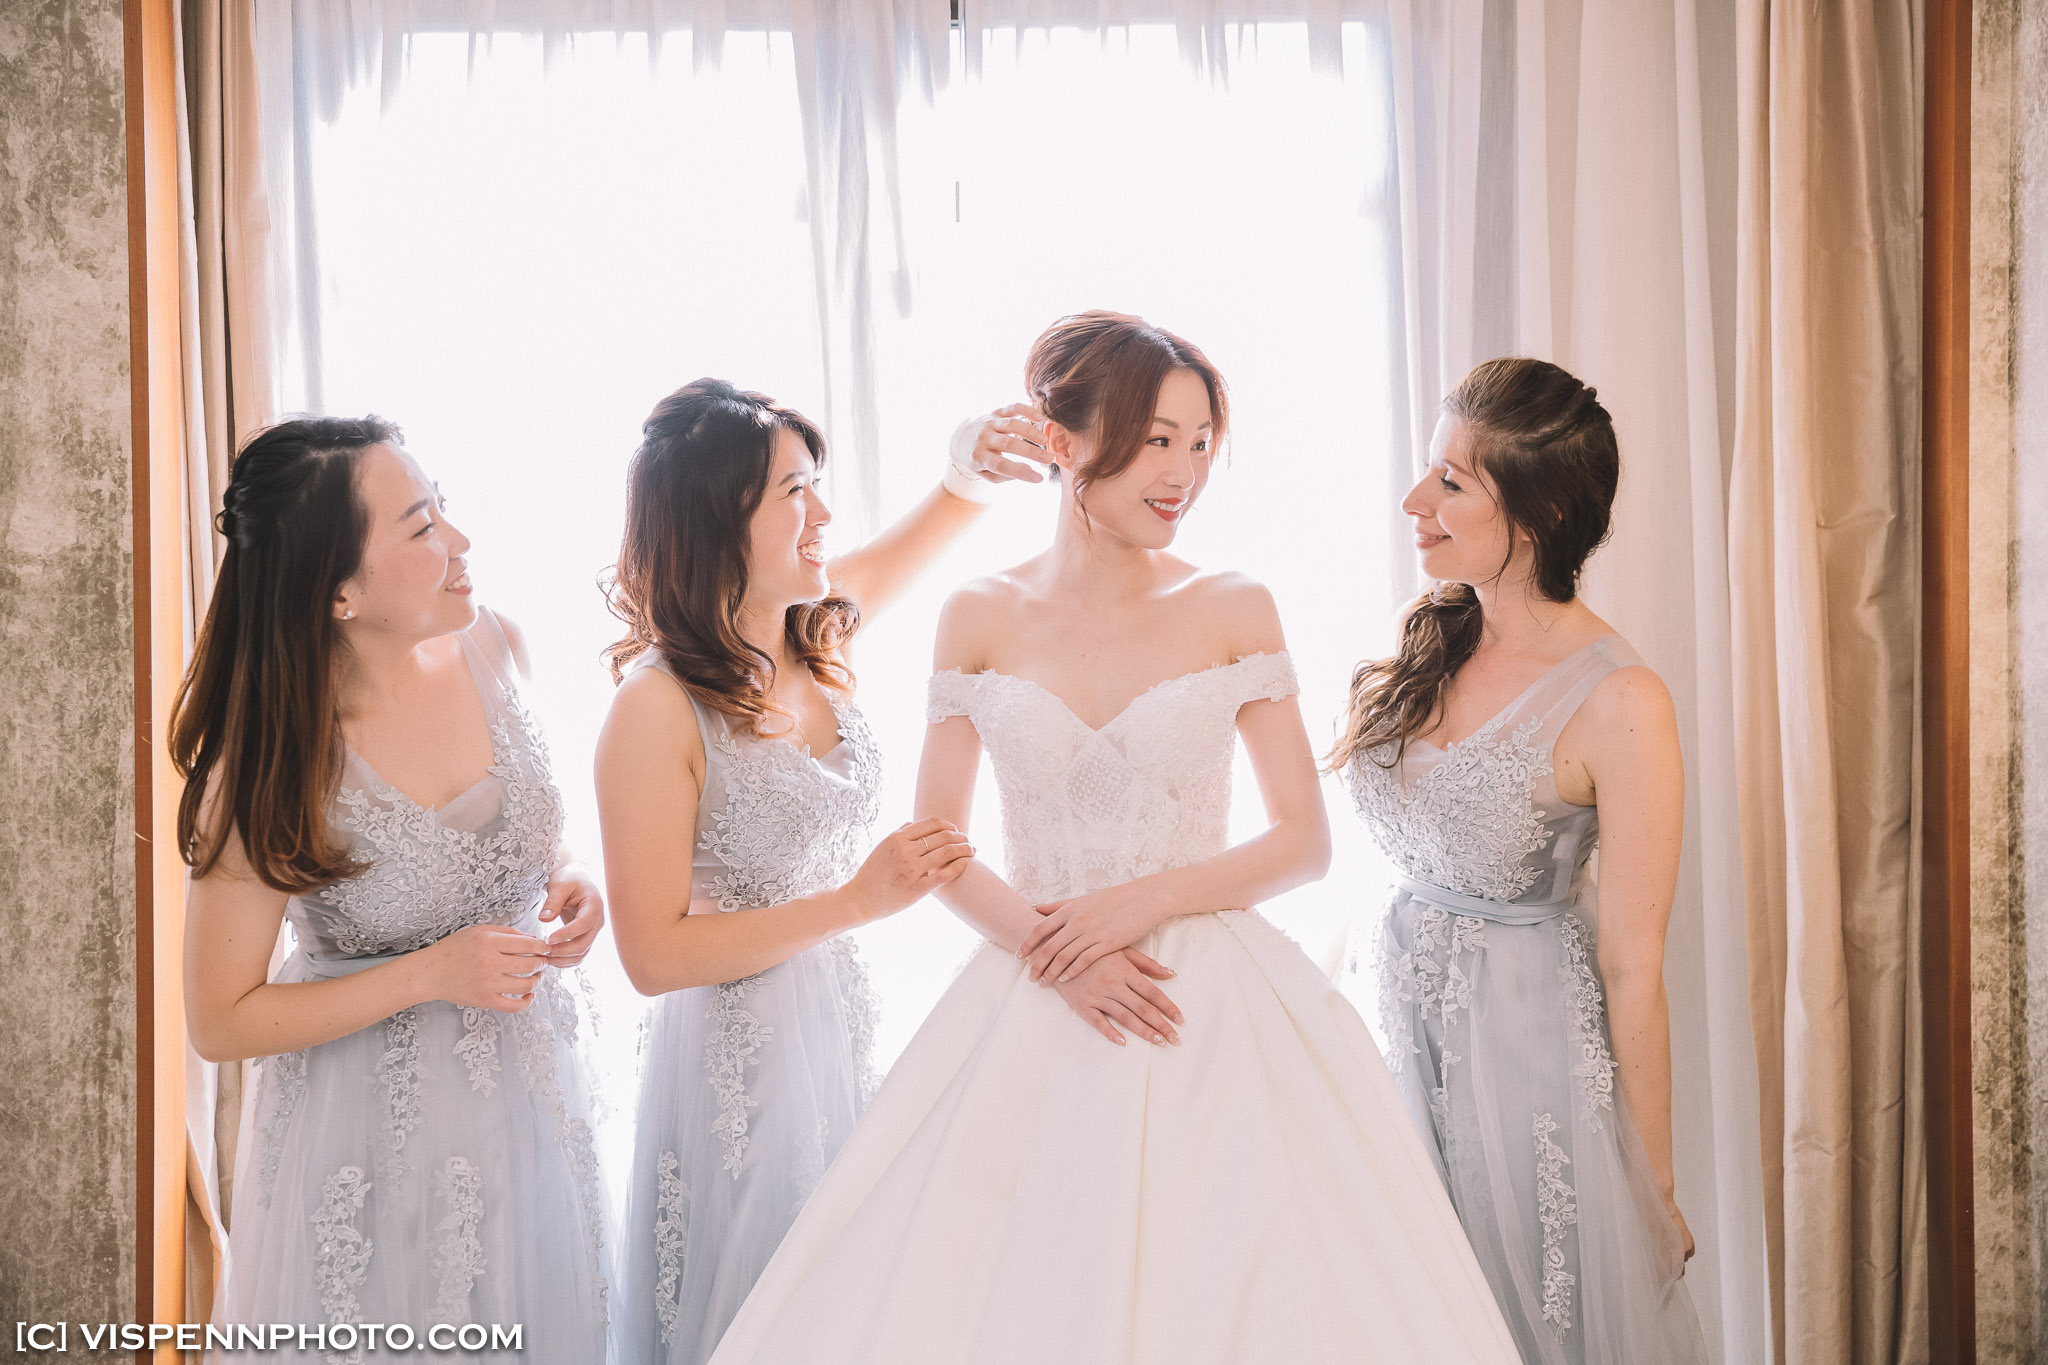 WEDDING DAY Photography Melbourne VISPENN 墨尔本 婚礼跟拍 婚礼摄像 婚礼摄影 结婚照 登记照 VISPENN 1P 1DX 00289